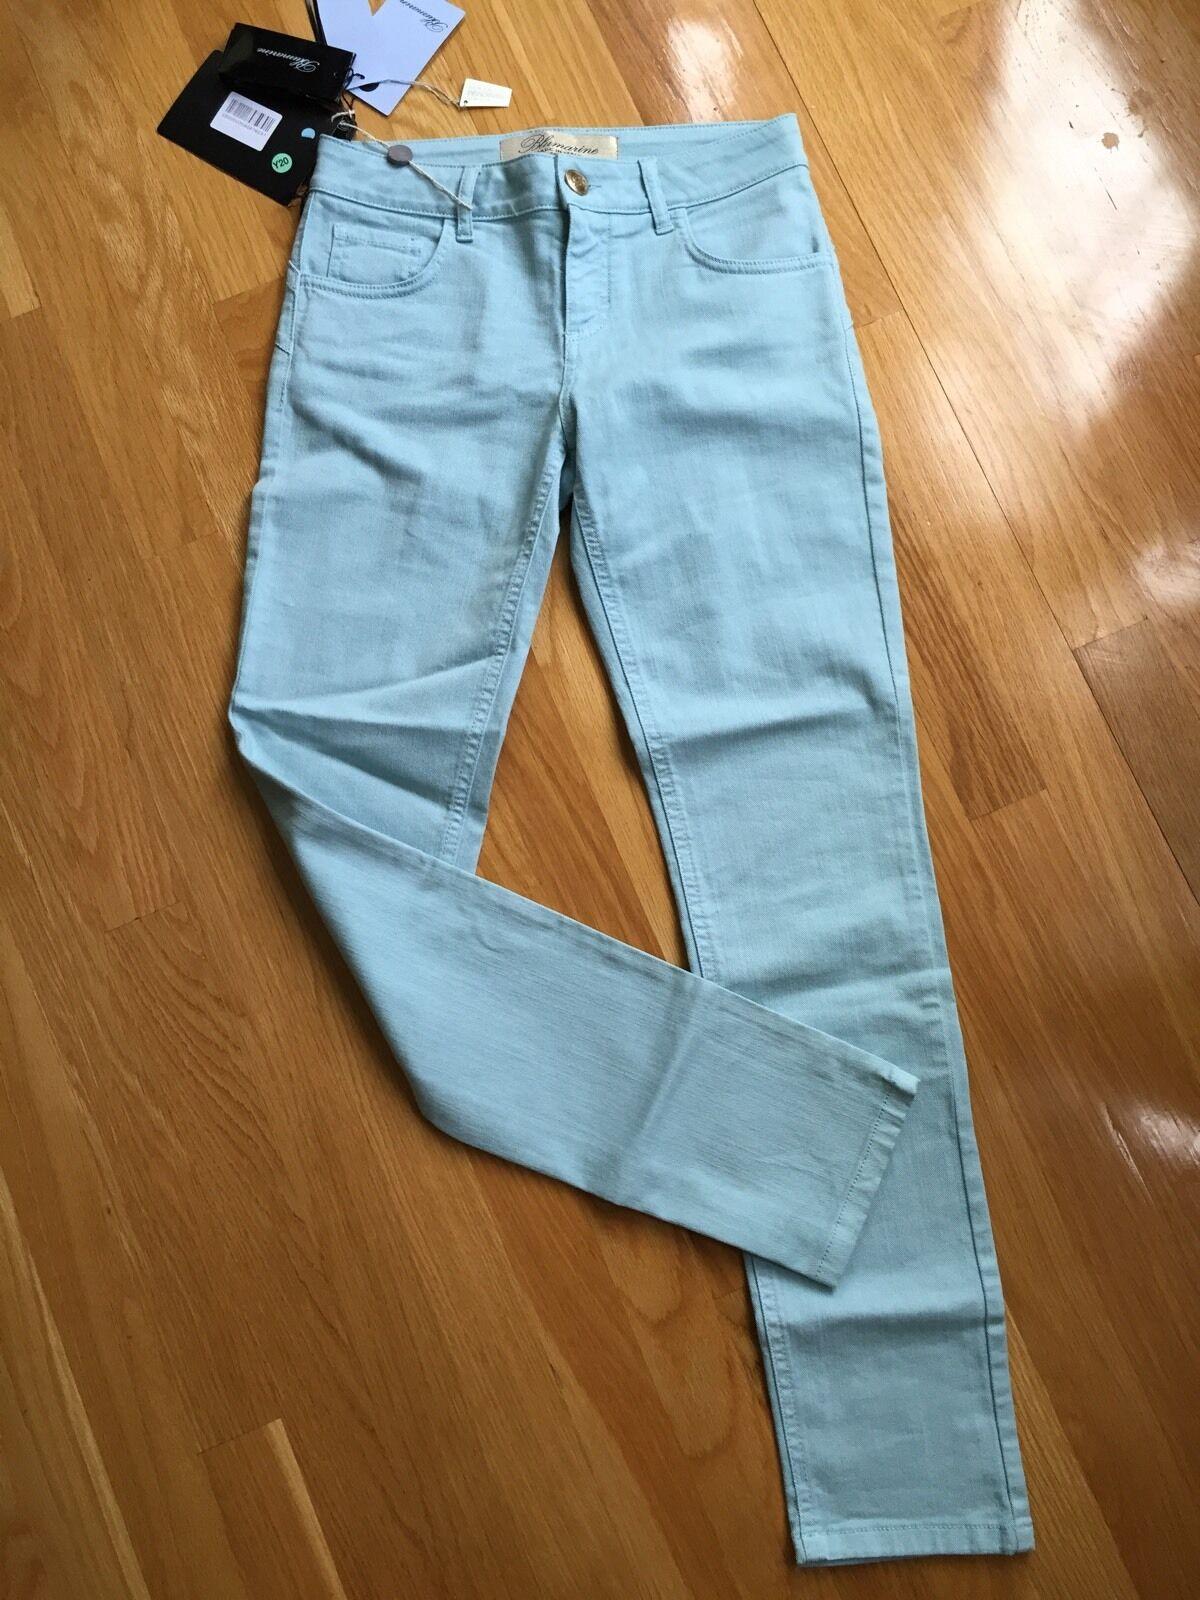 NWT Blaumarine Blau Rhinestone Logo Pants Größe 40IT